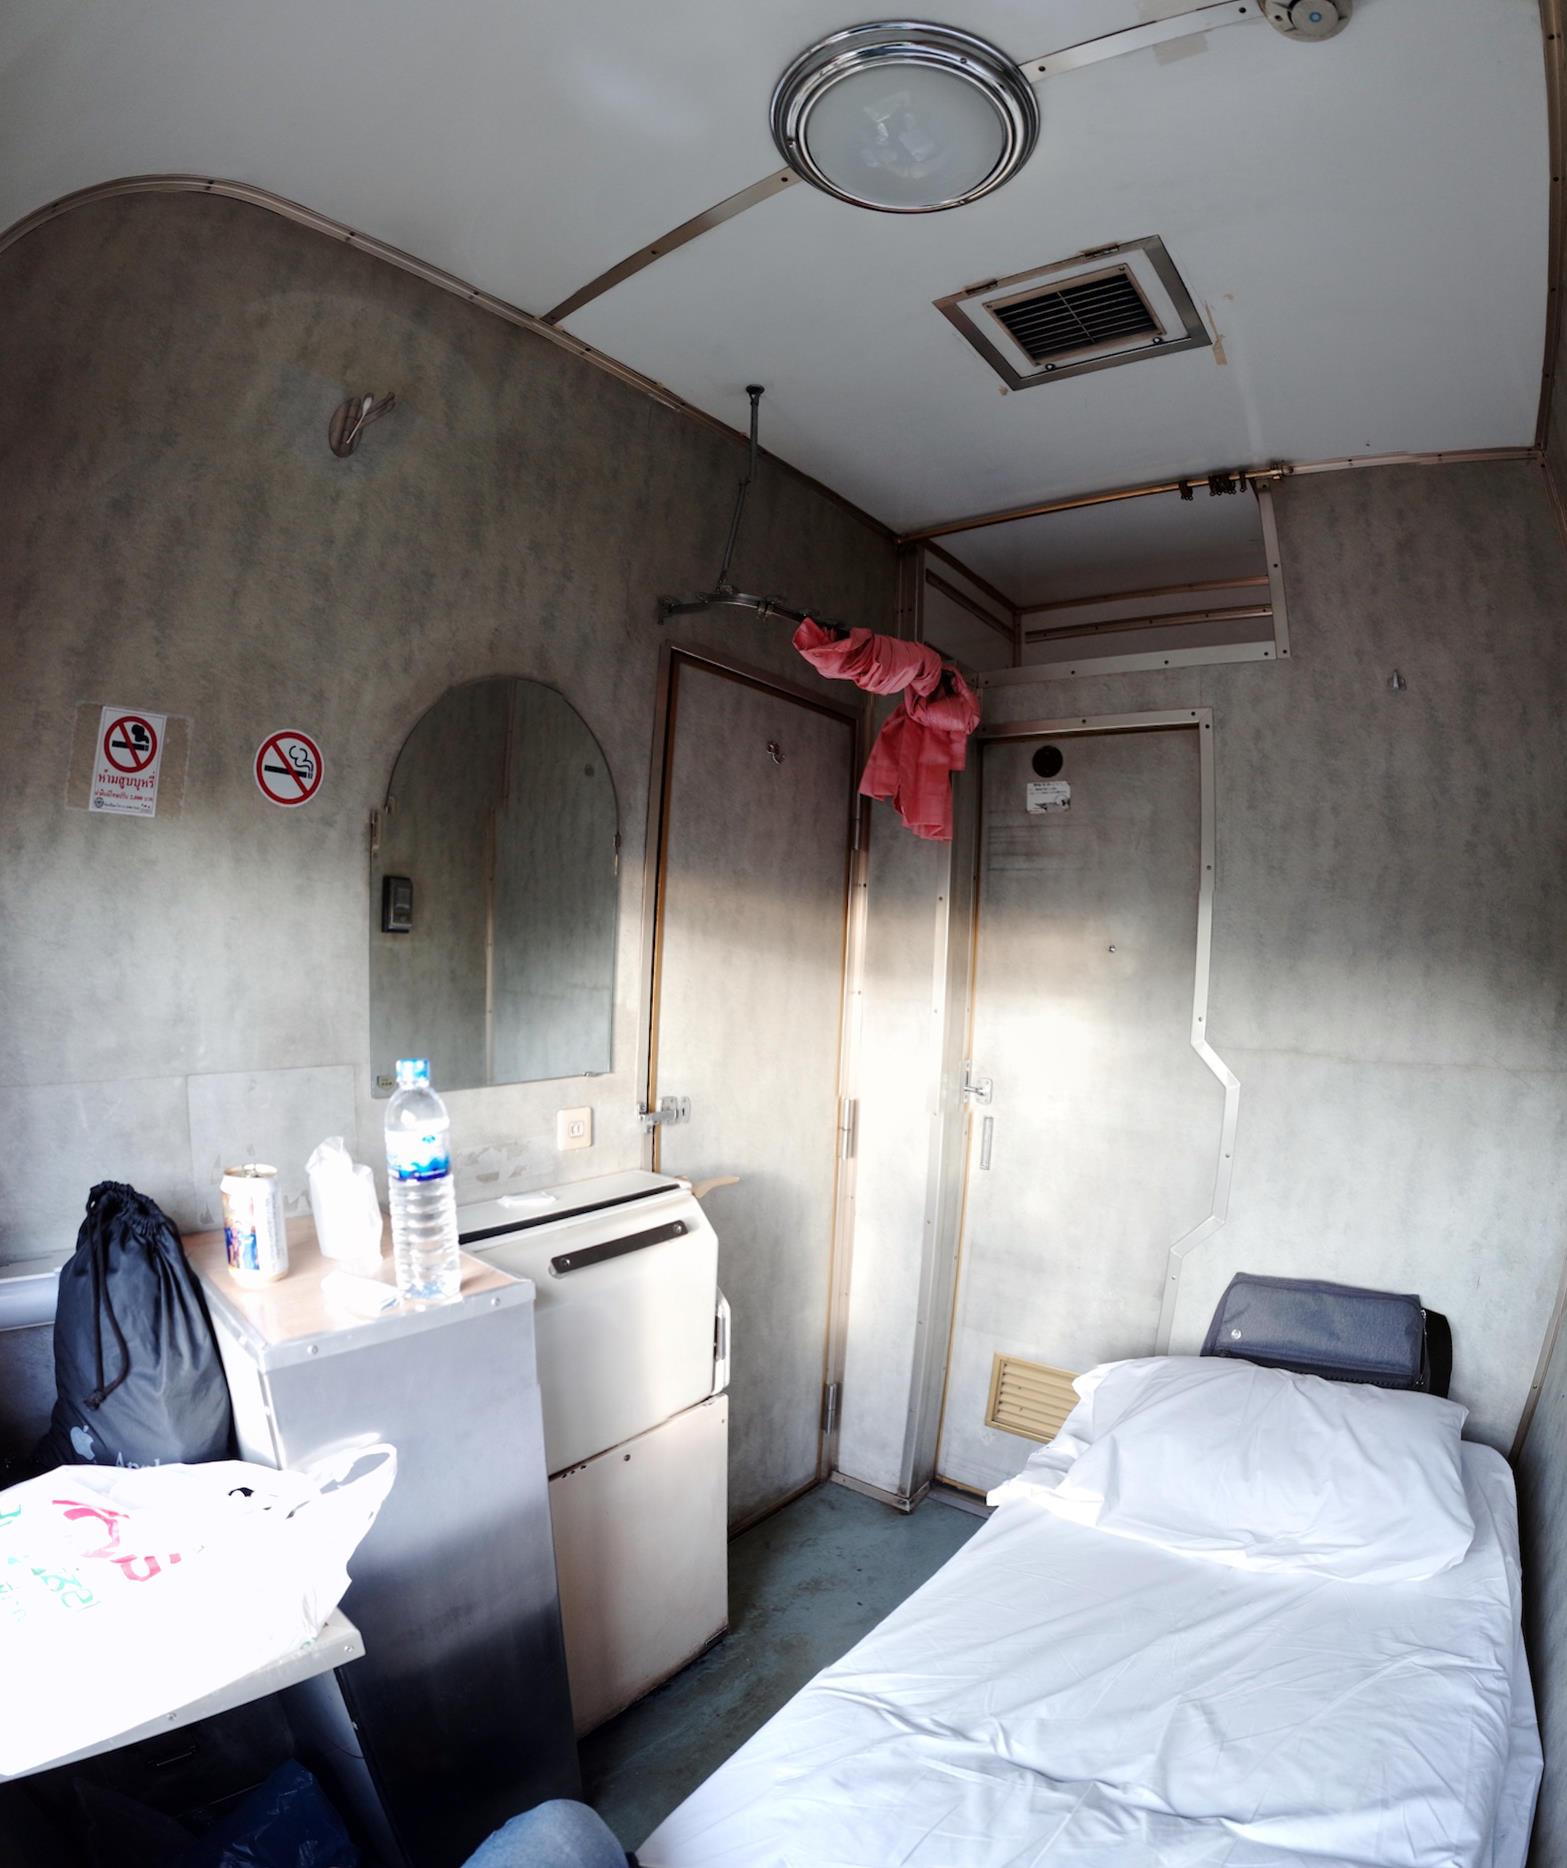 A寝台の旅(2) - Yの王宮